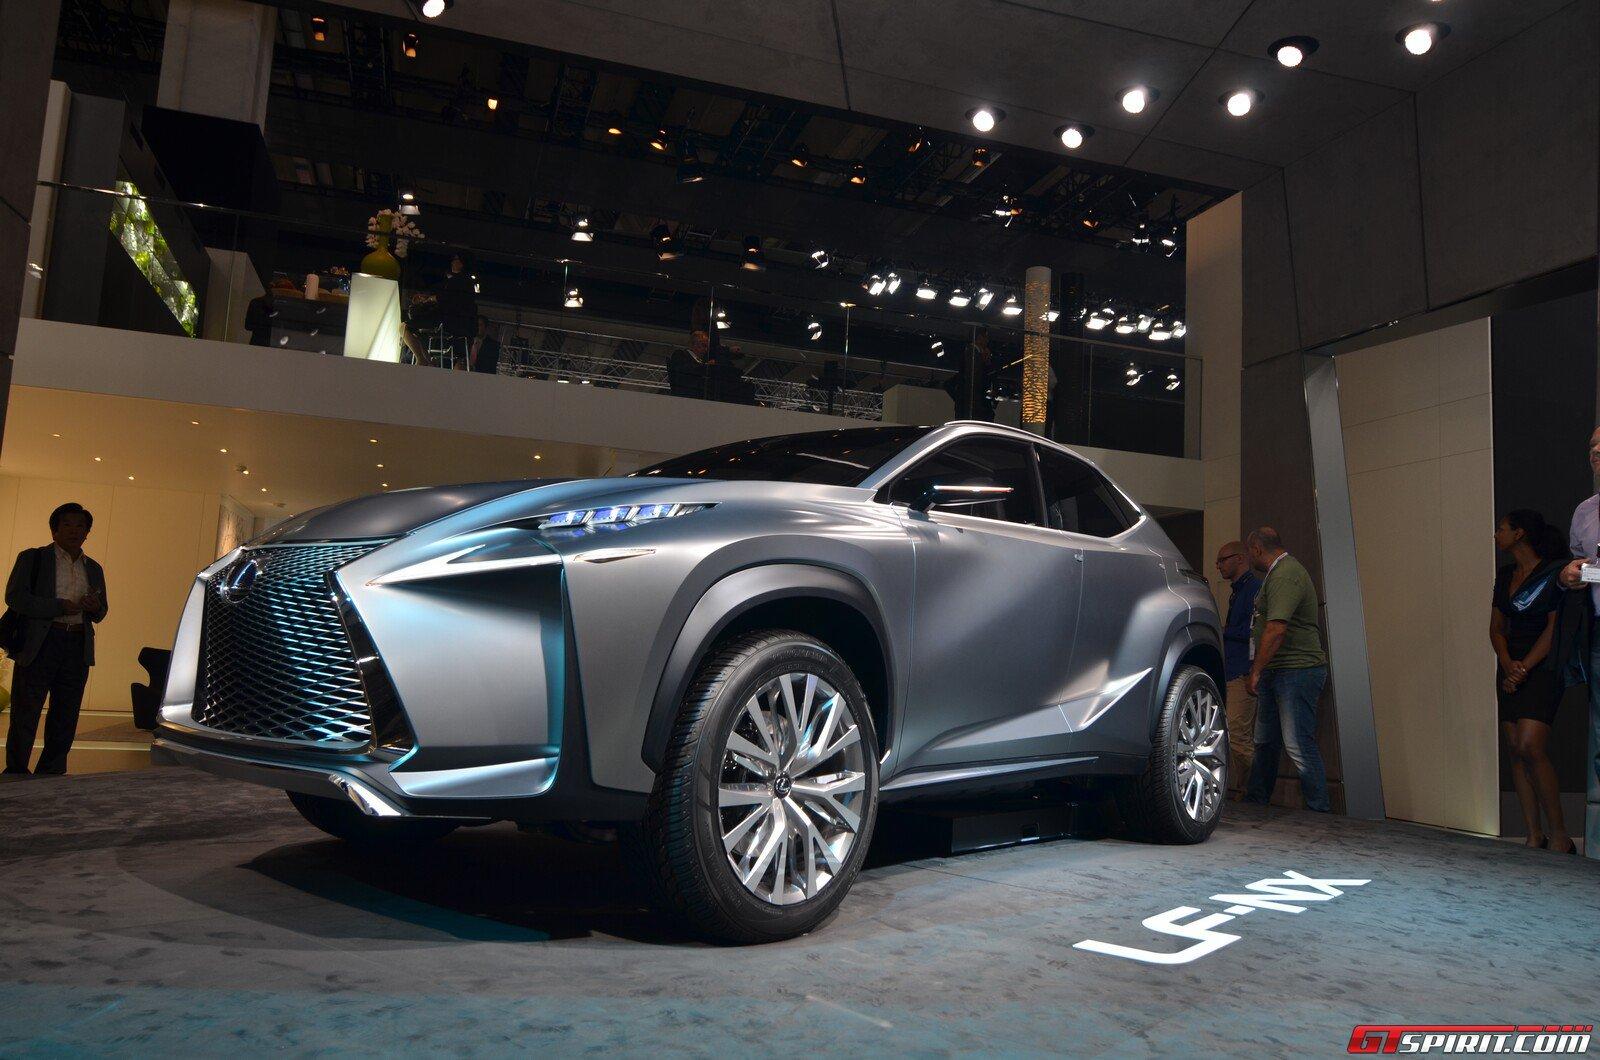 Frankfurt 2013: Lexus LF-NX Crossover Concept - GTspirit